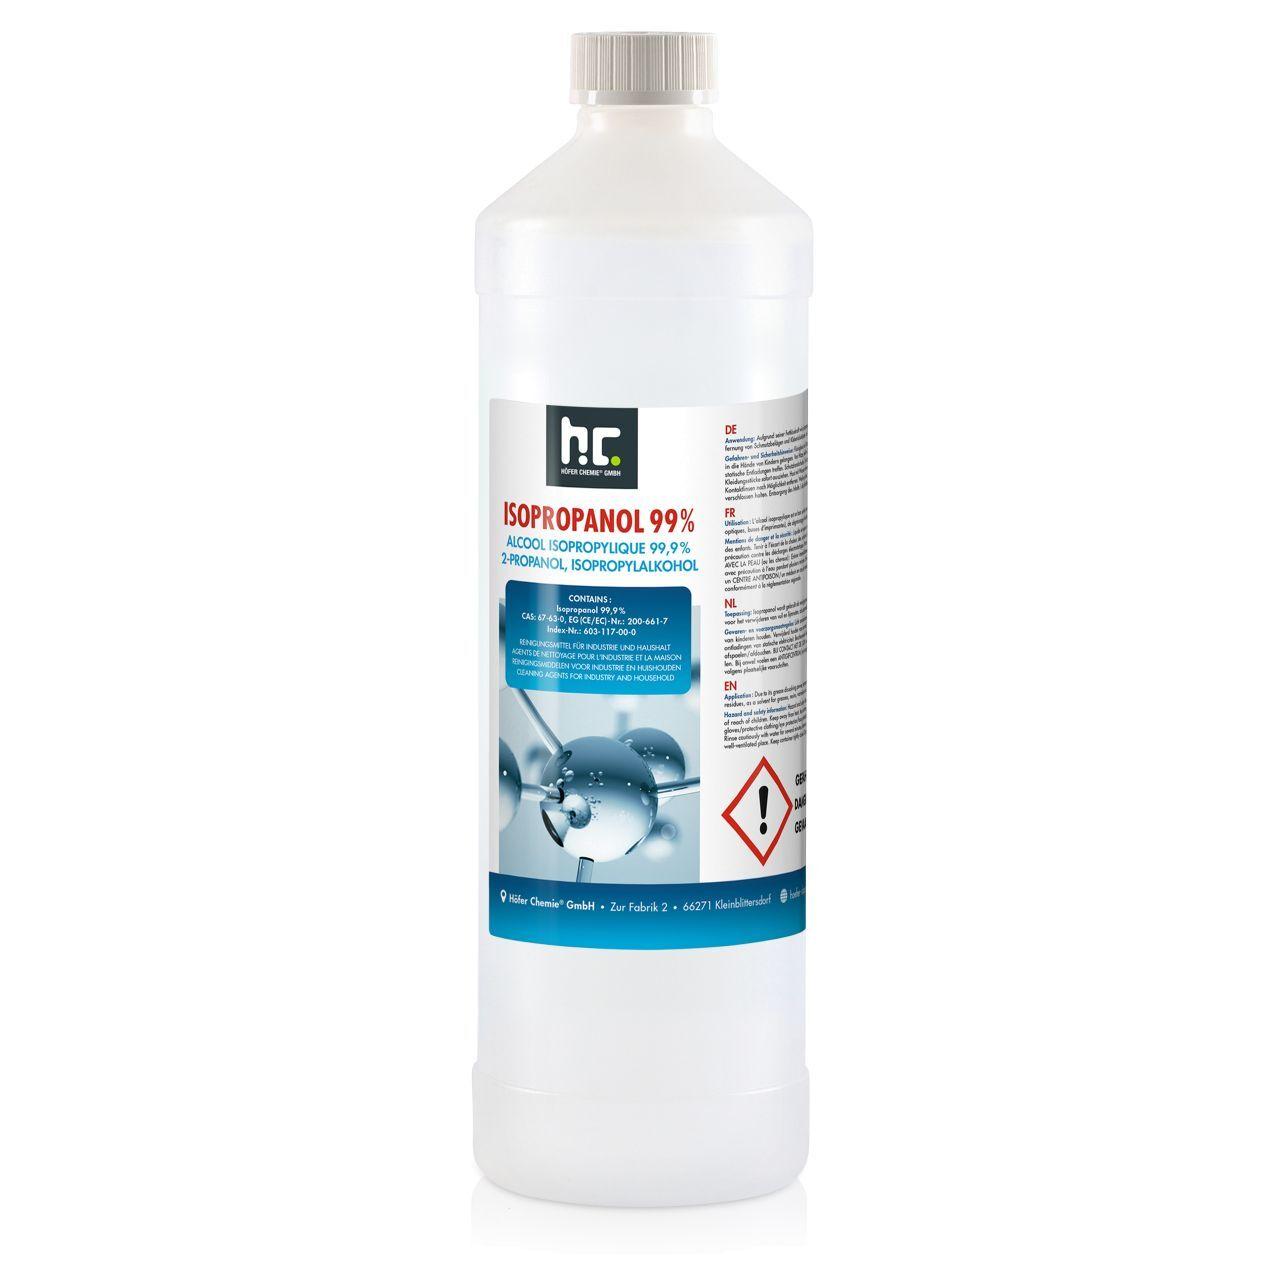 Höfer Chemie 6 l Alcool isopropylique 99,9 % (6 x 1 l)